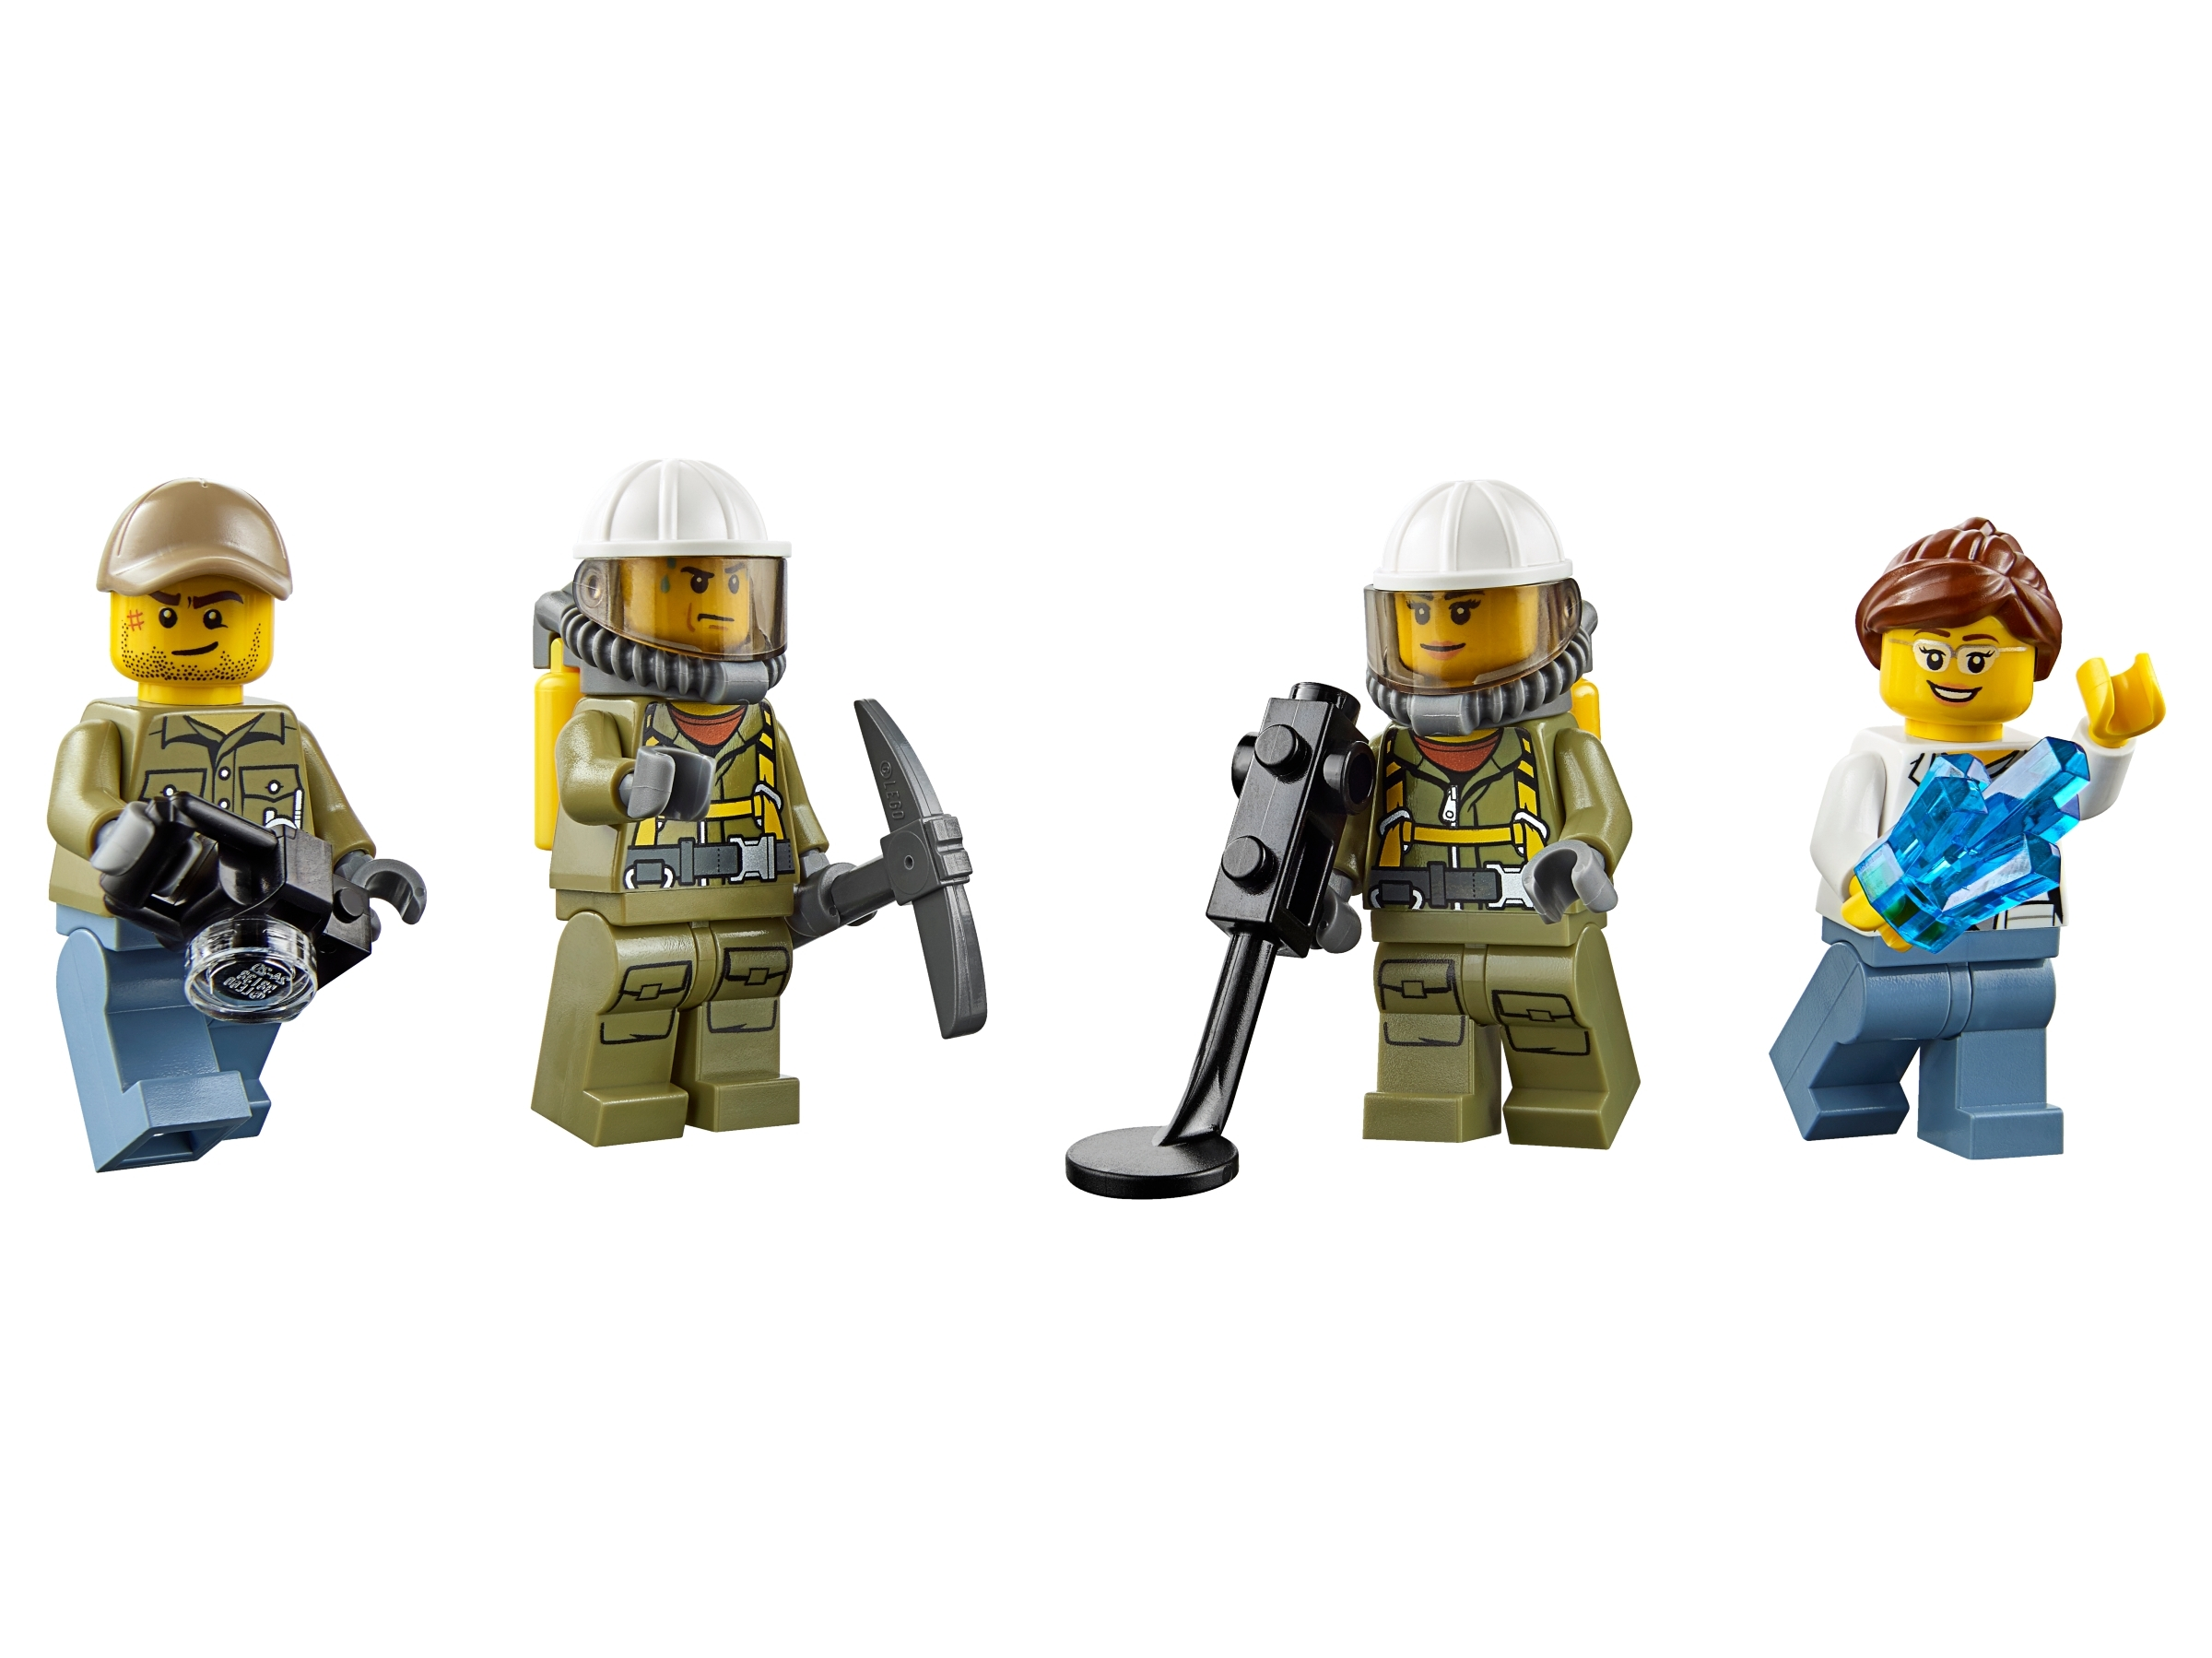 NEW LEGO VOLCANO STARTER Set 60120 Sealed Box